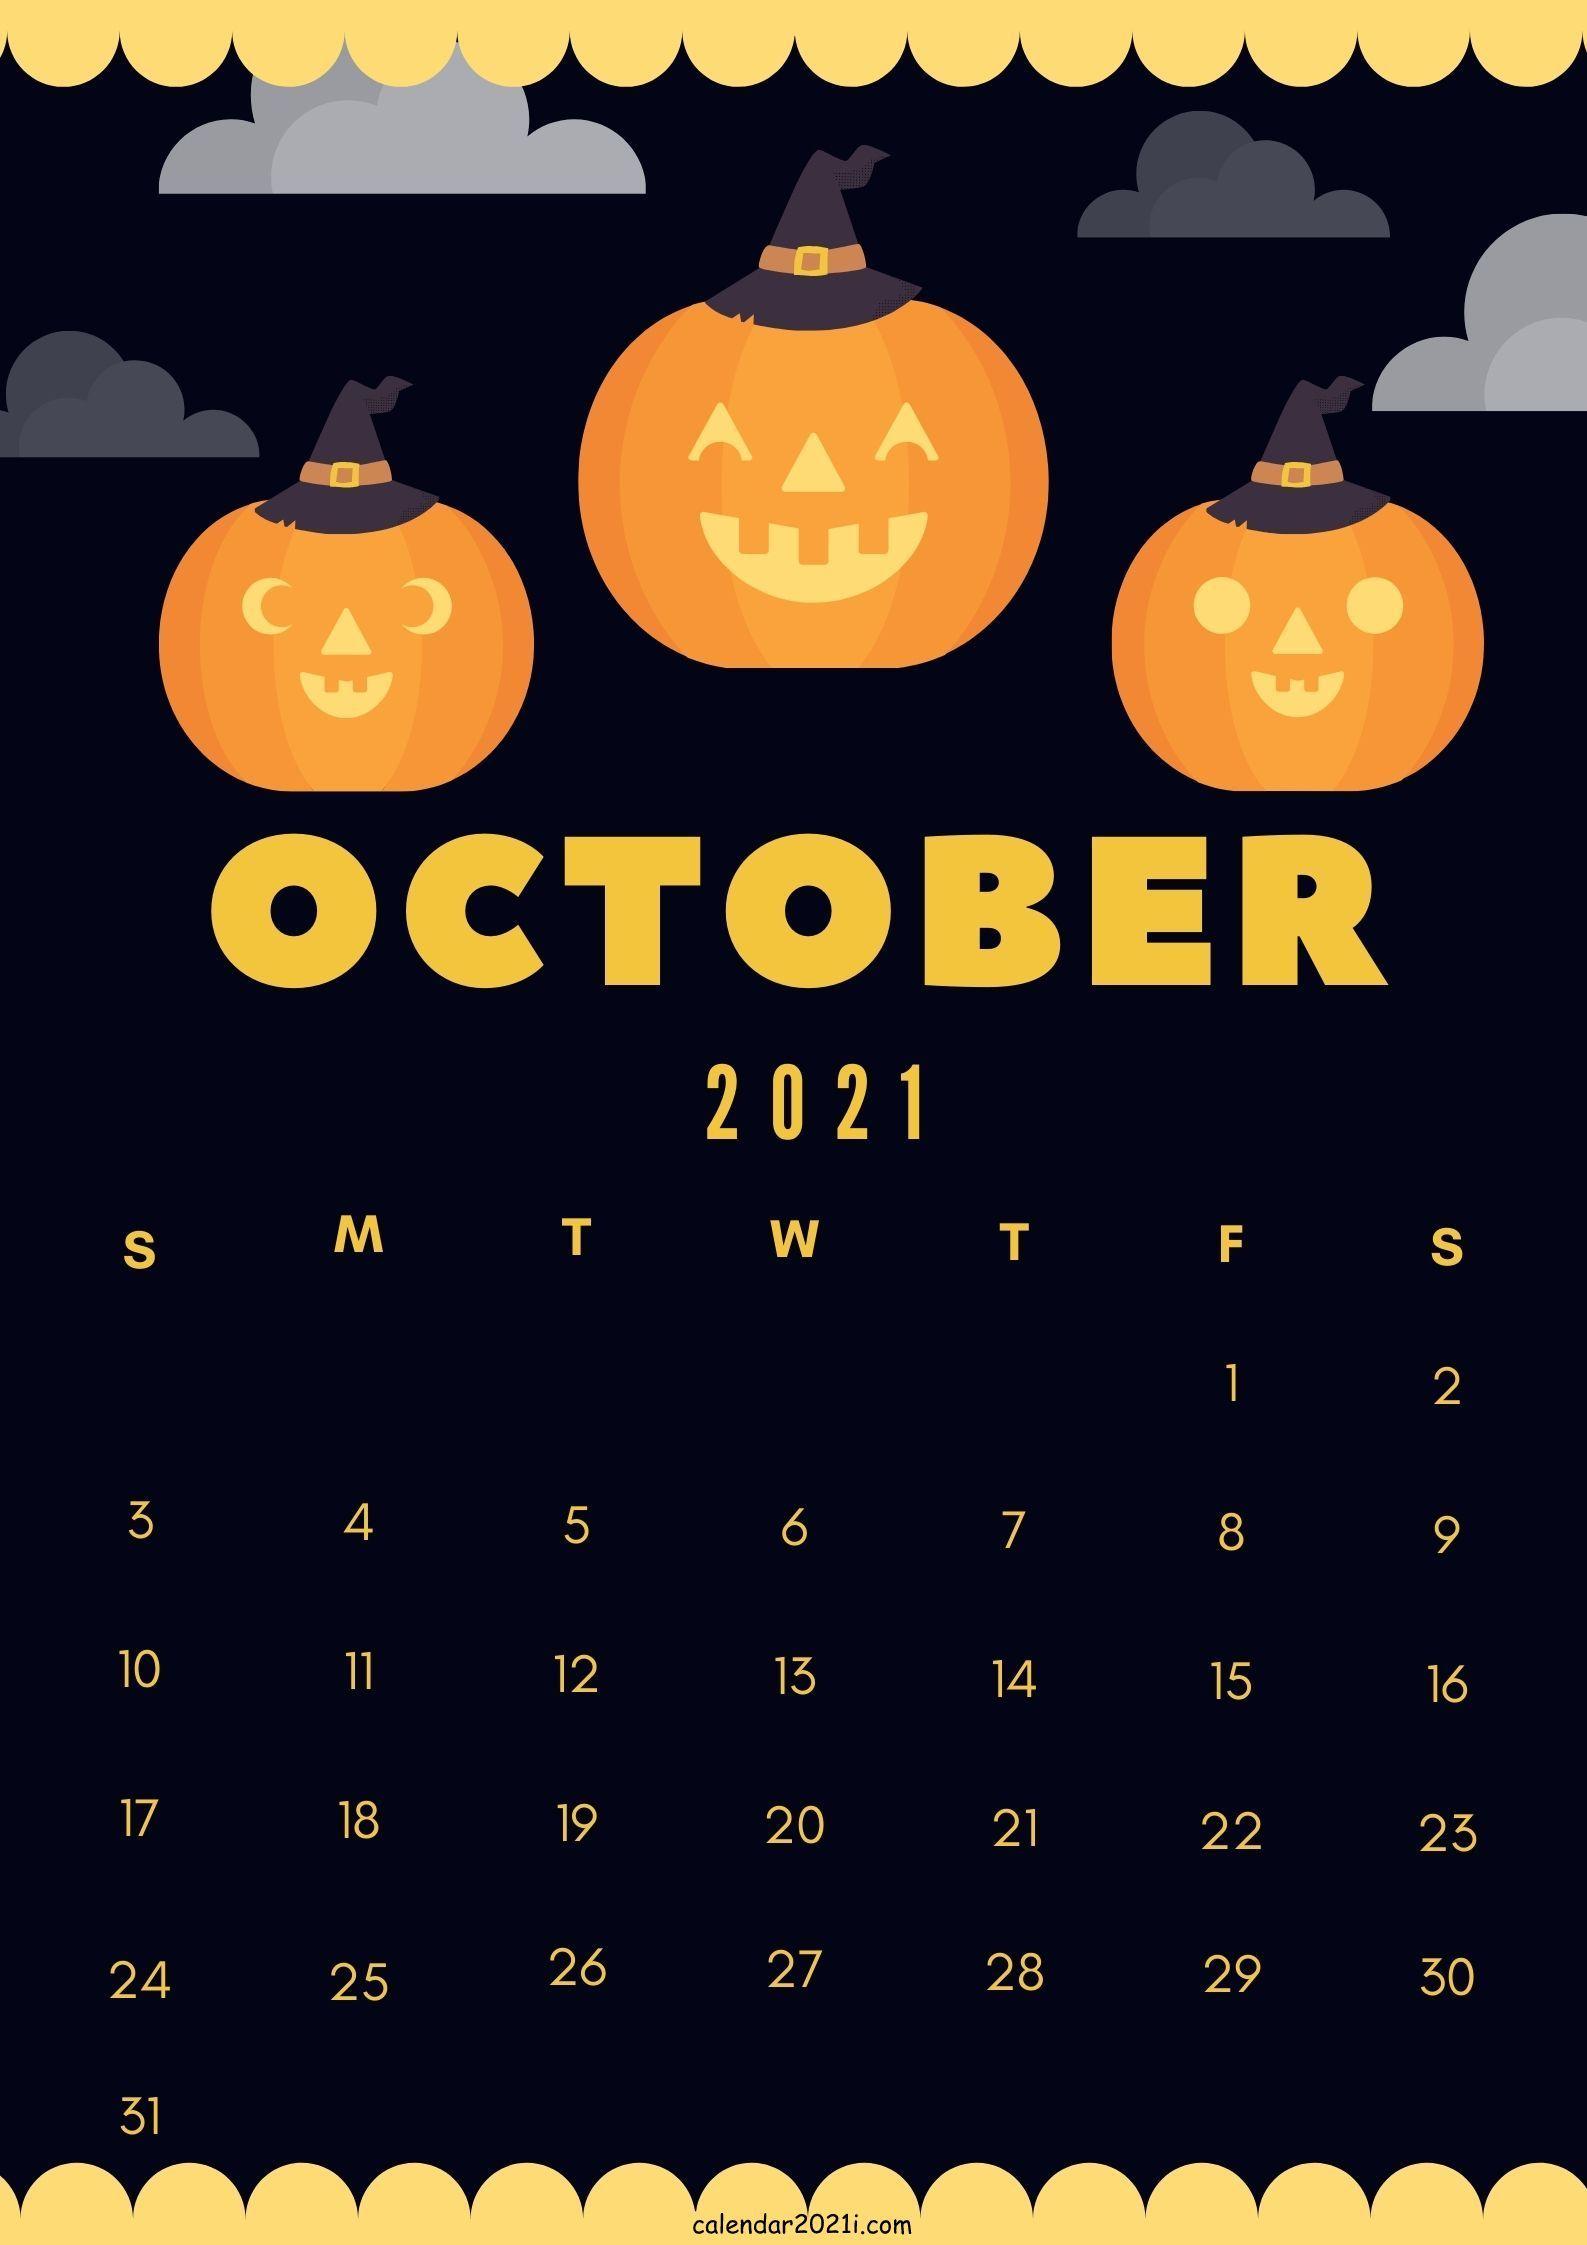 Halloween 2021 Calendar Cute October 2021 calendar design DIY theme layout free download